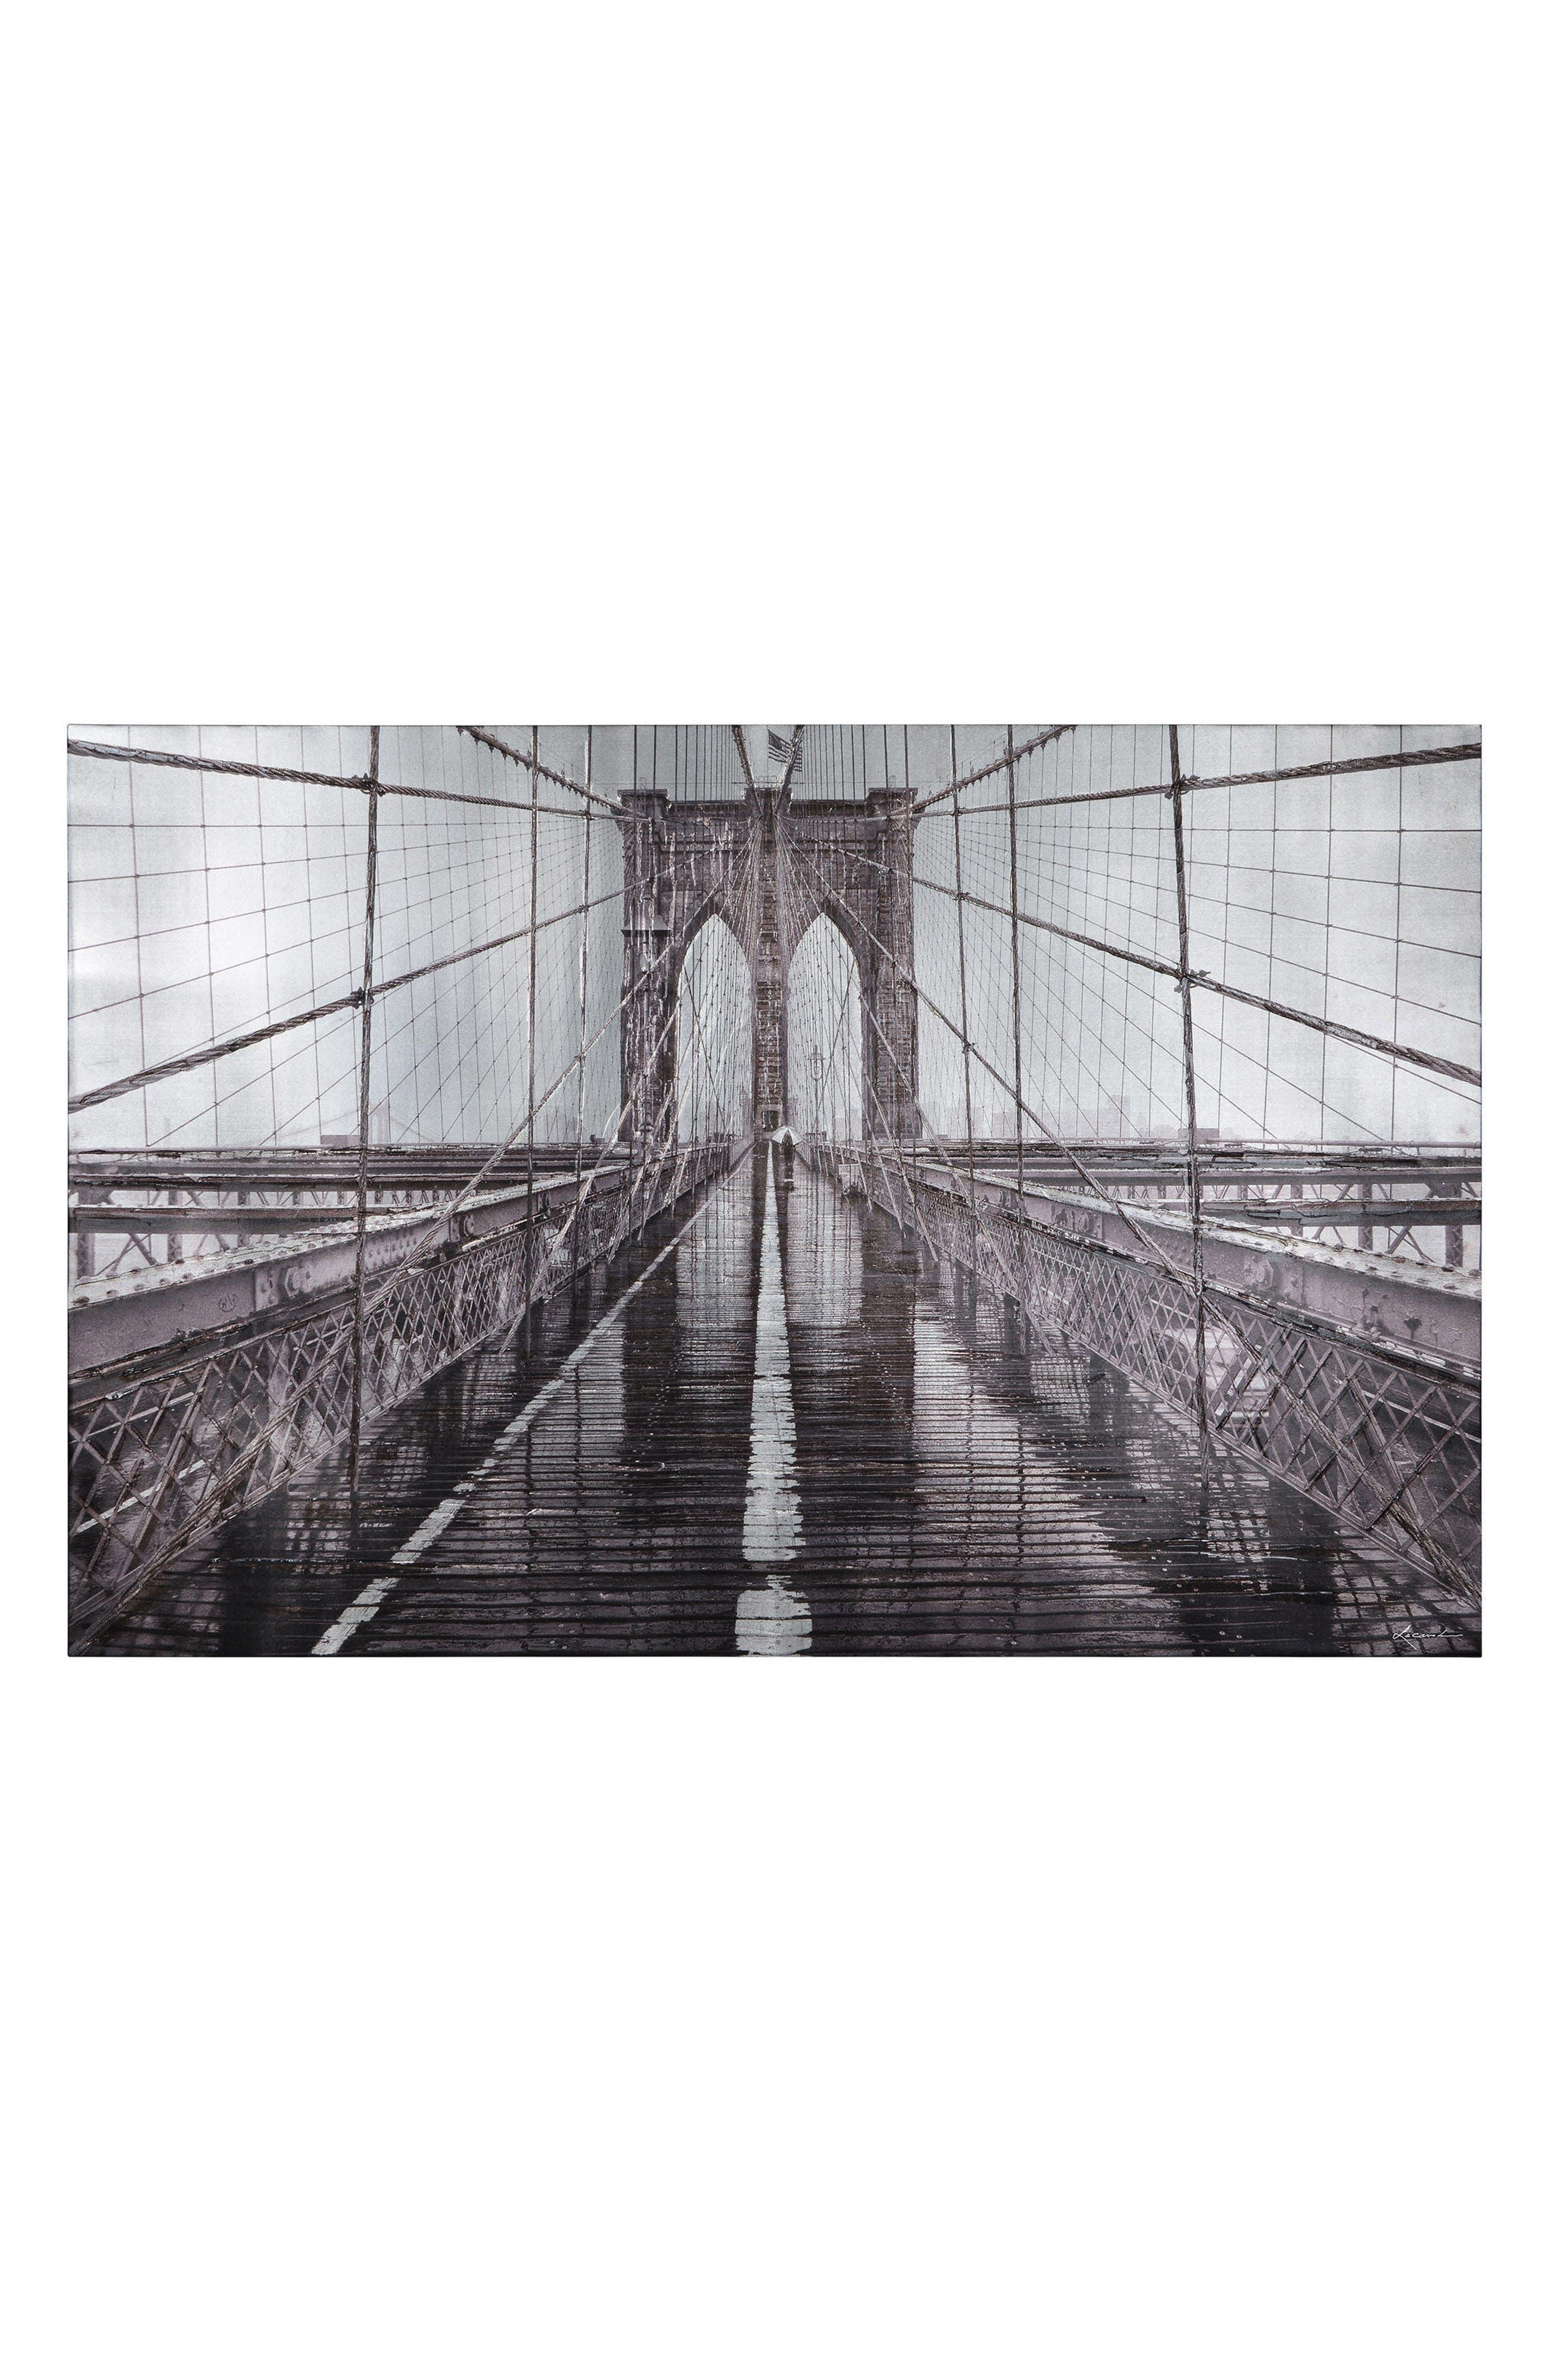 Alternate Image 1 Selected - Renwil Iconic Brooklyn Bridge Canvas Wall Art